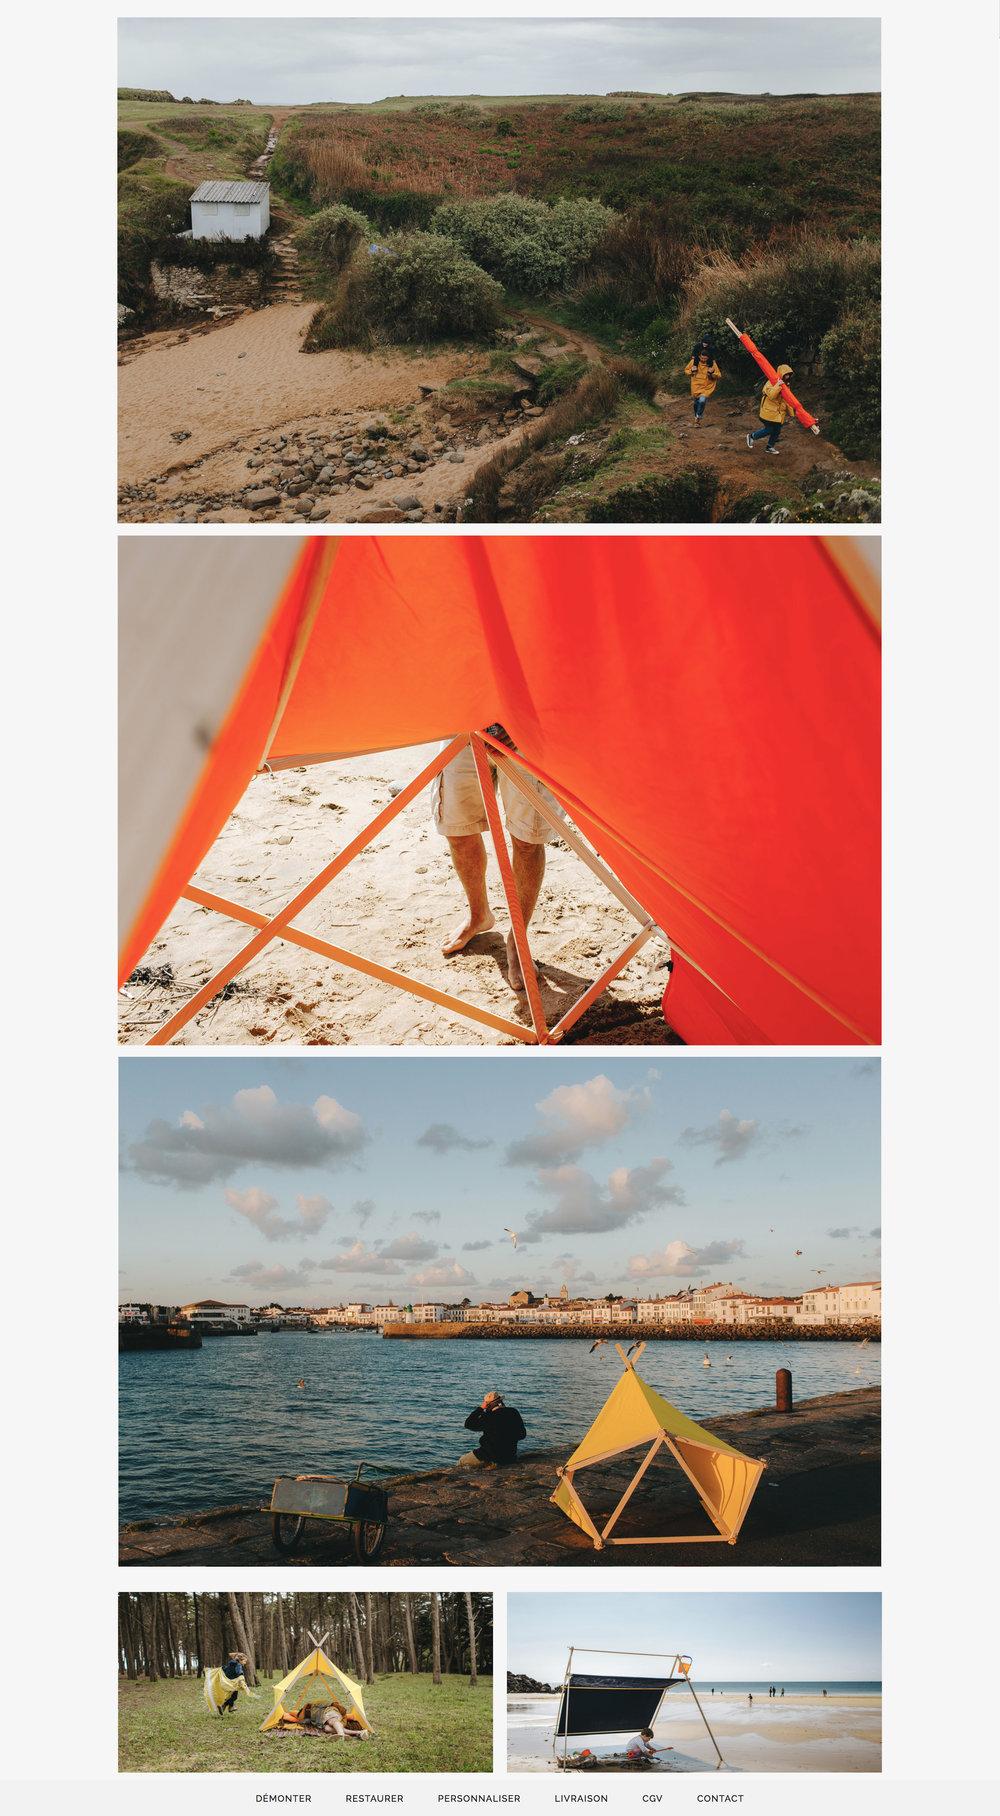 Tente-Islaise-Fabien-Courmont-île-dyeu3.jpg